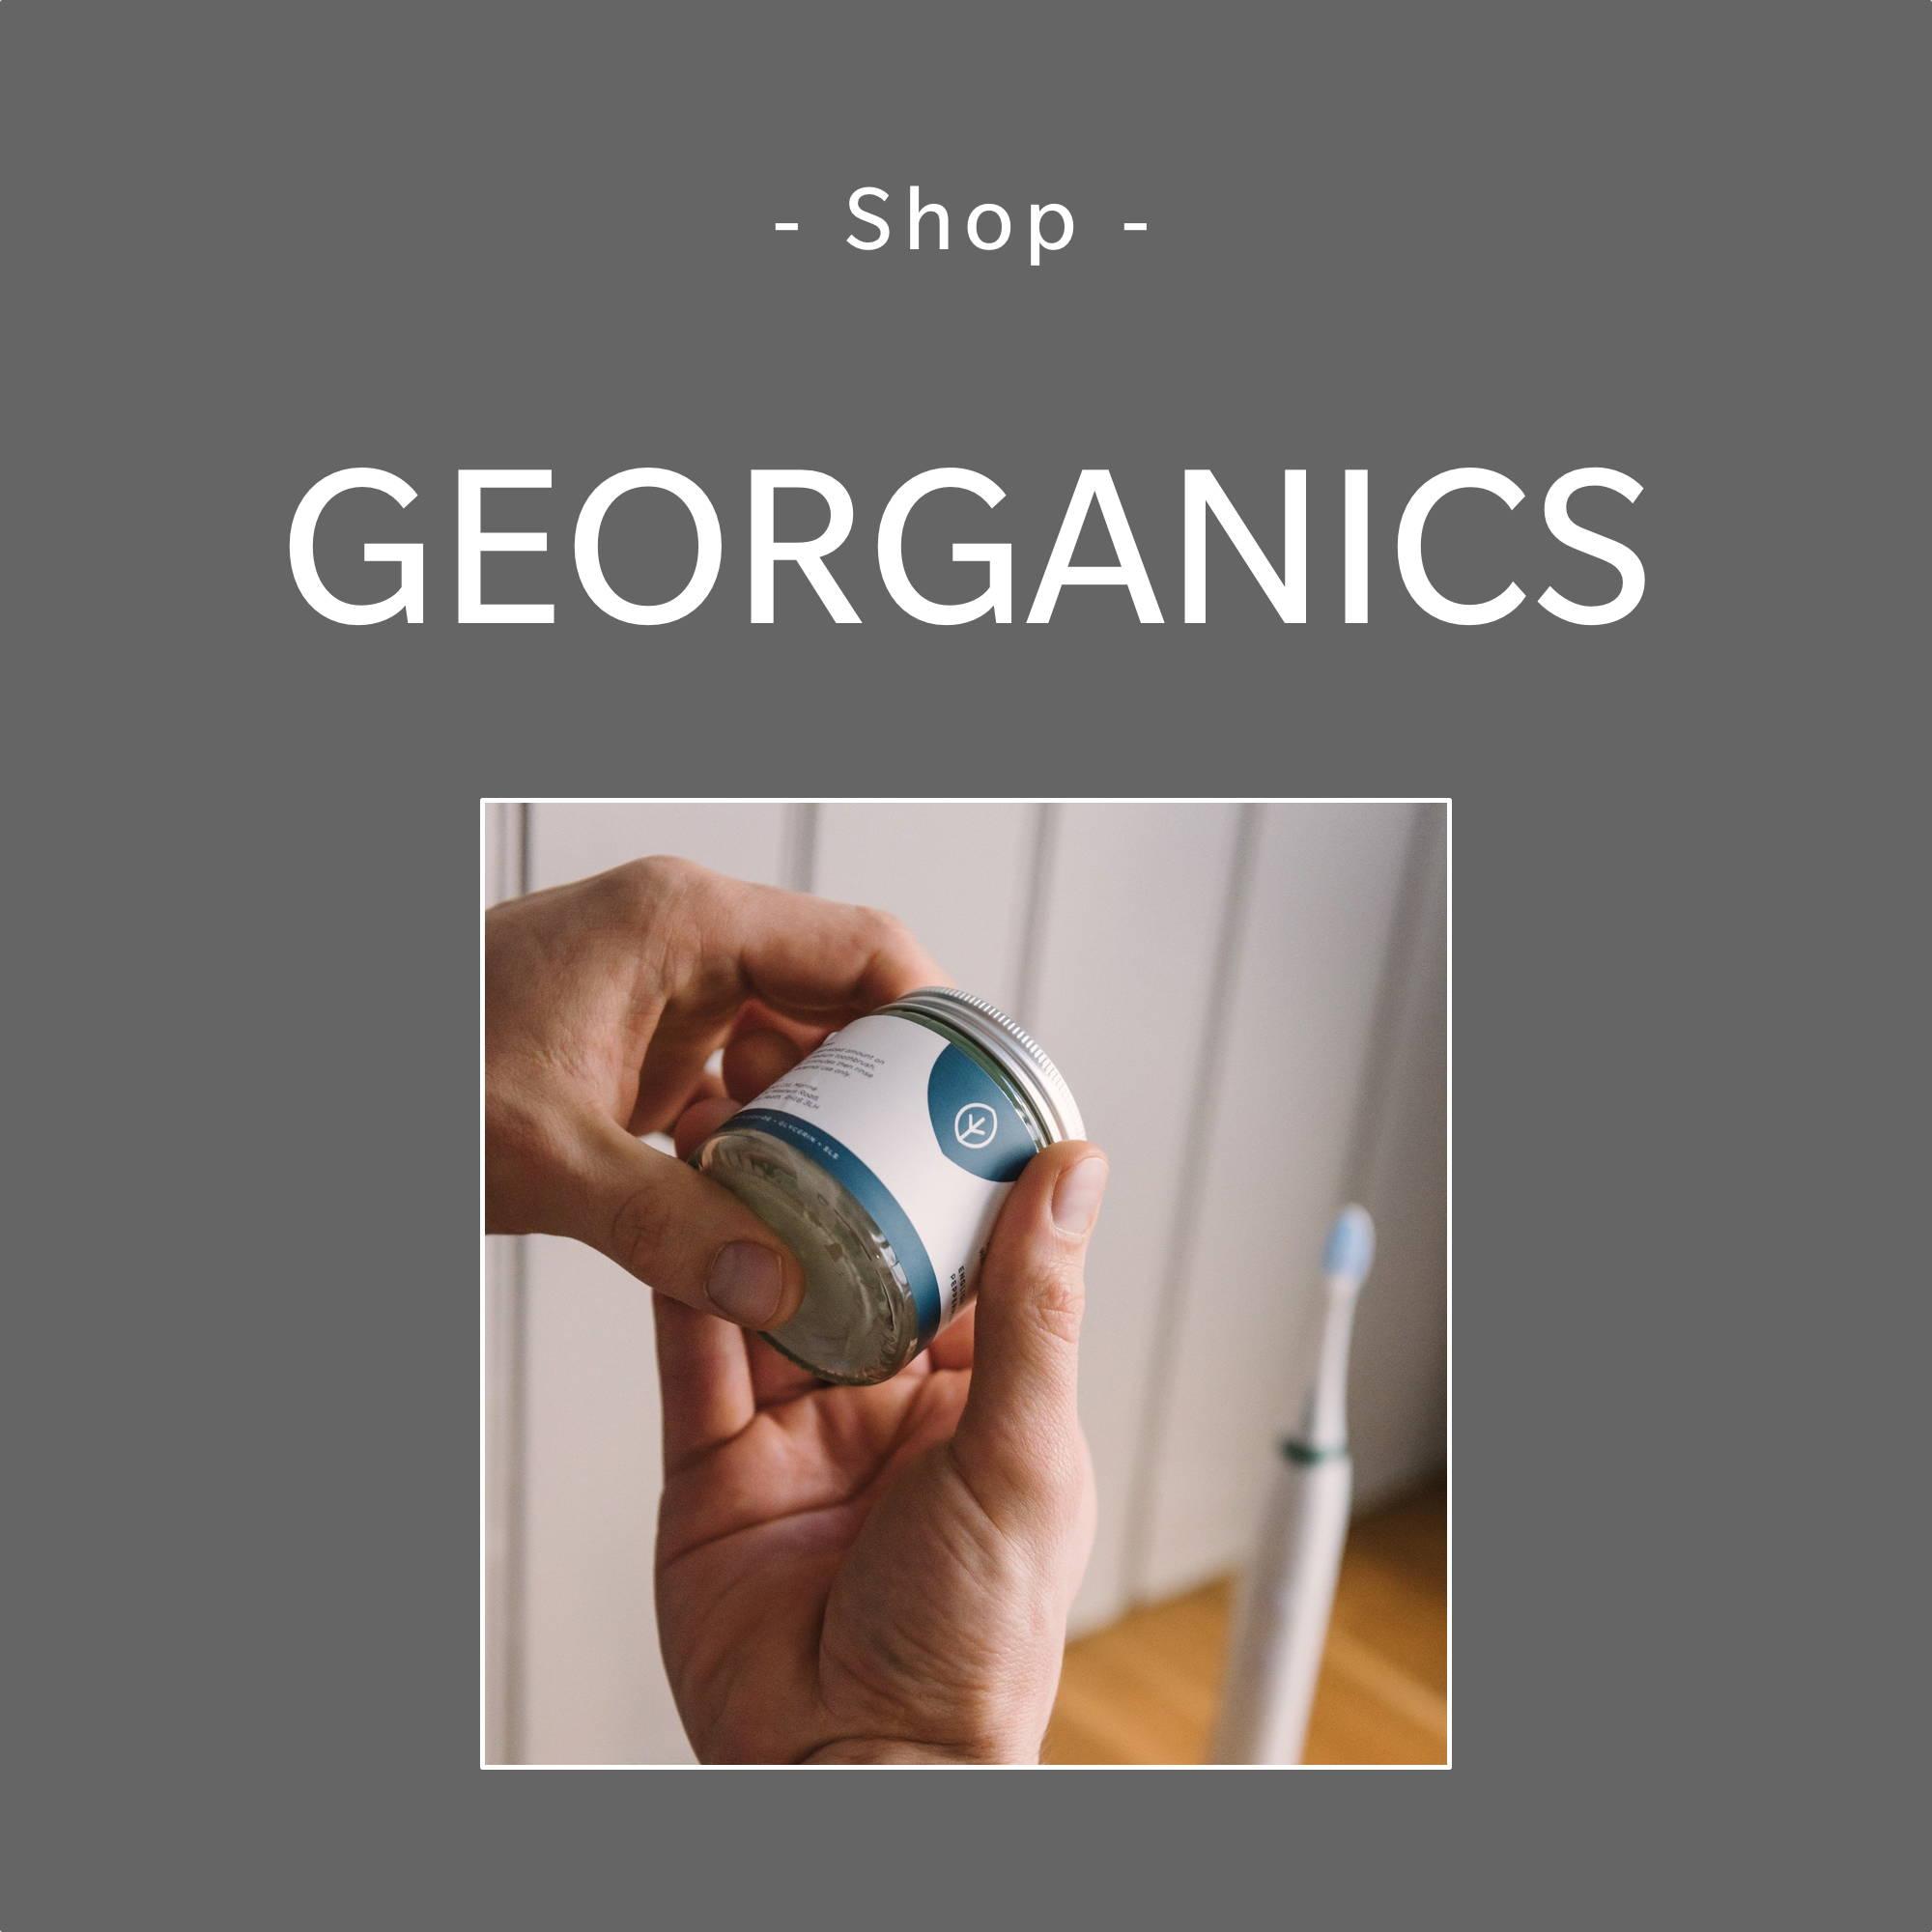 Georganics Brand Page